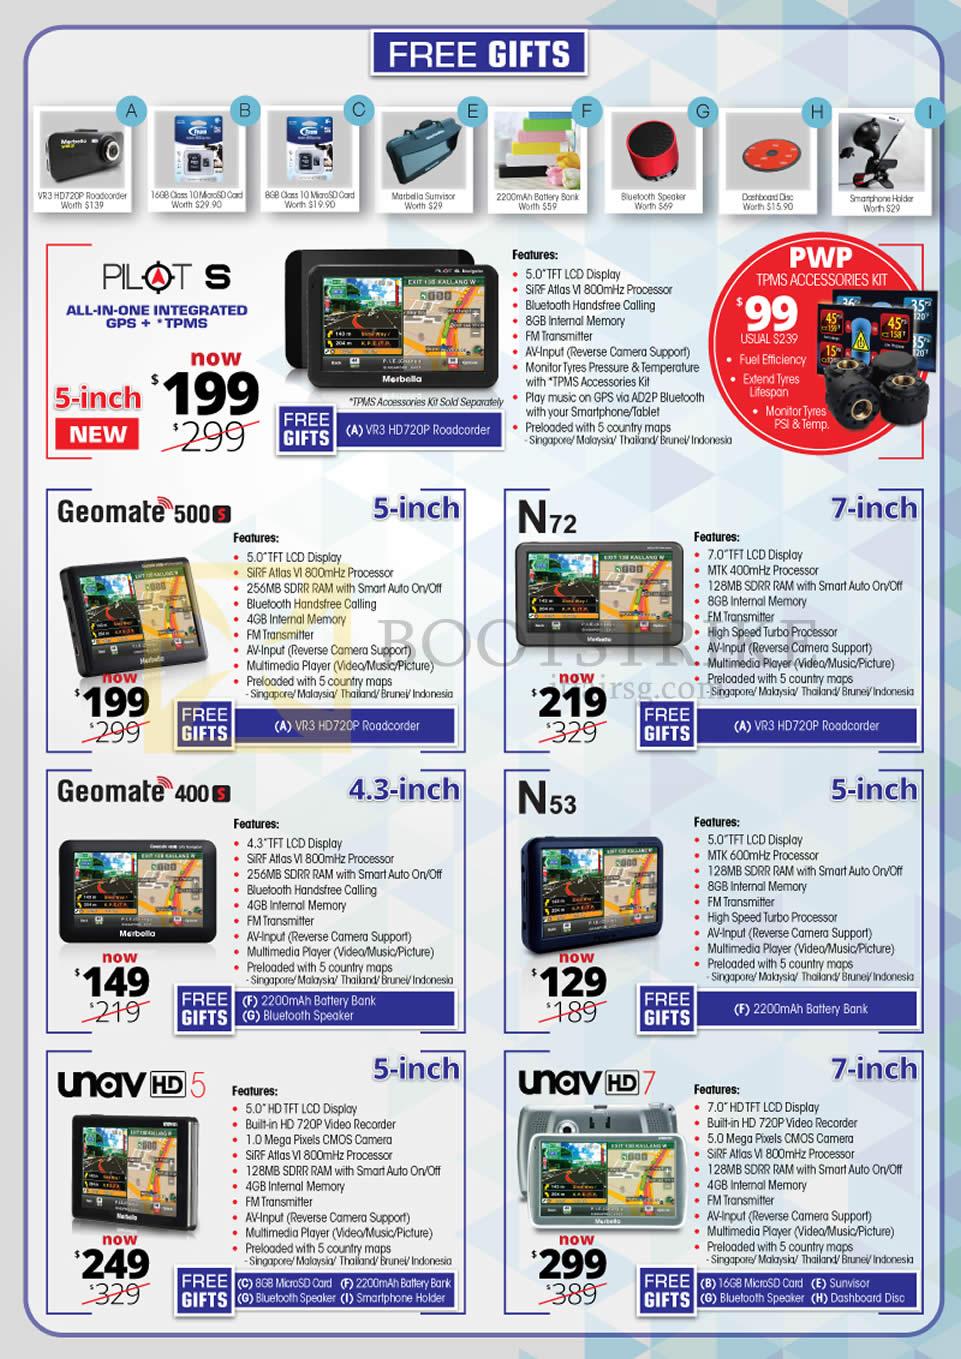 PC SHOW 2016 price list image brochure of Maka GPS Marbella Navigators Pilot S, Geomate 500S, 400S, N72, N53, Unav HD5, HD7